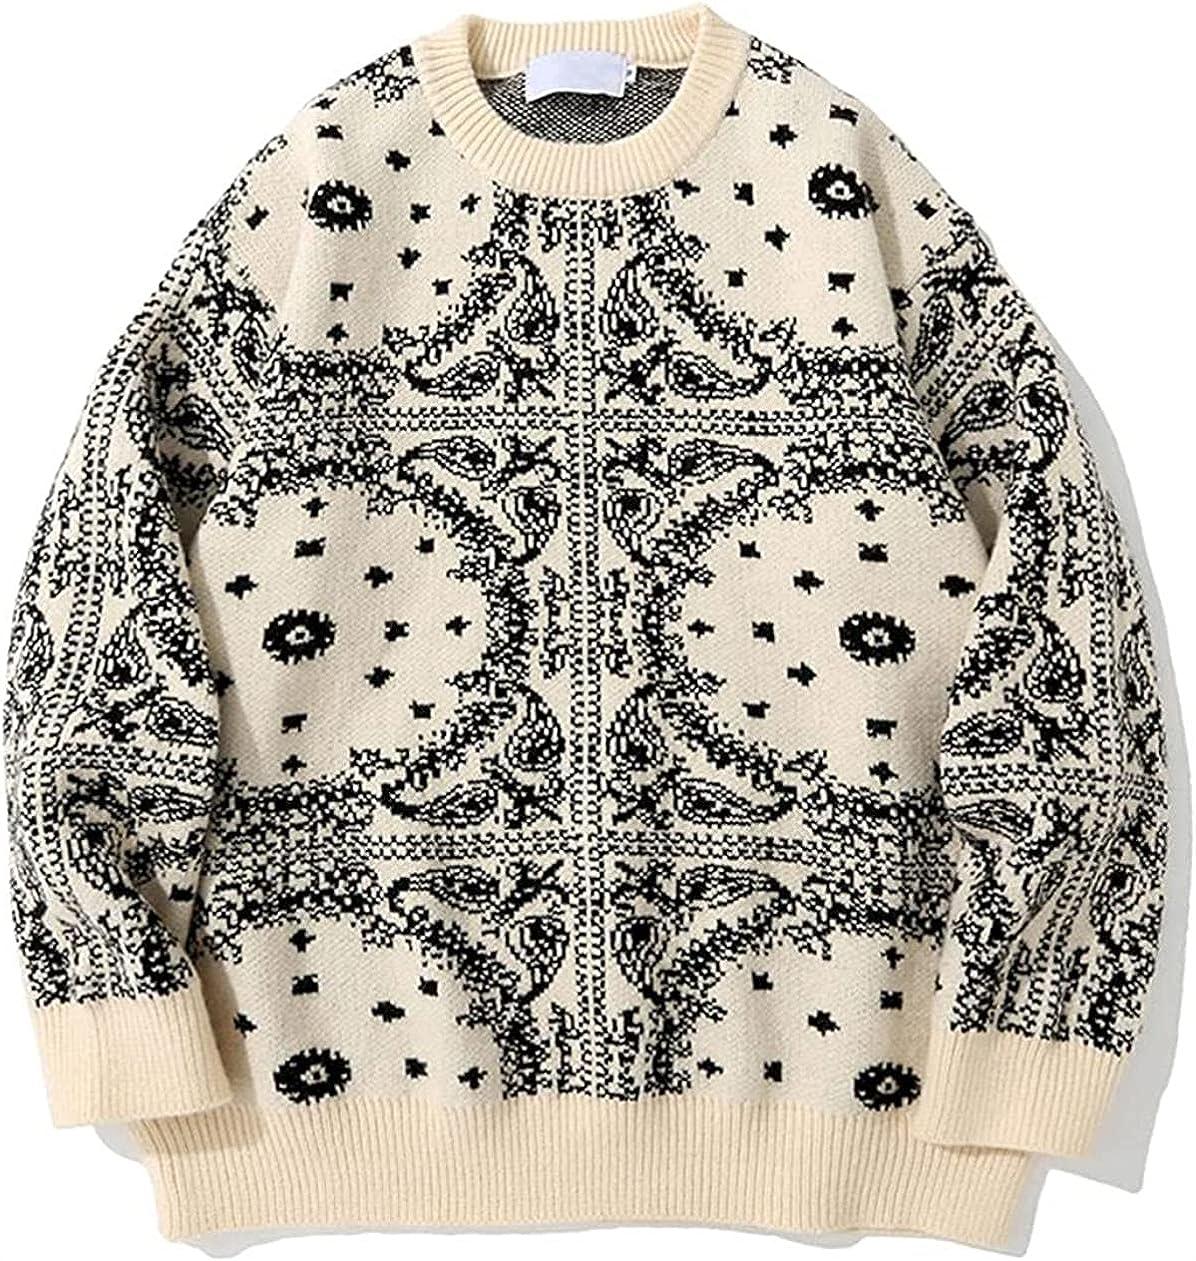 Men Sweater Streetwear Casual Pullover Tops Loose Harajuku Sweaters